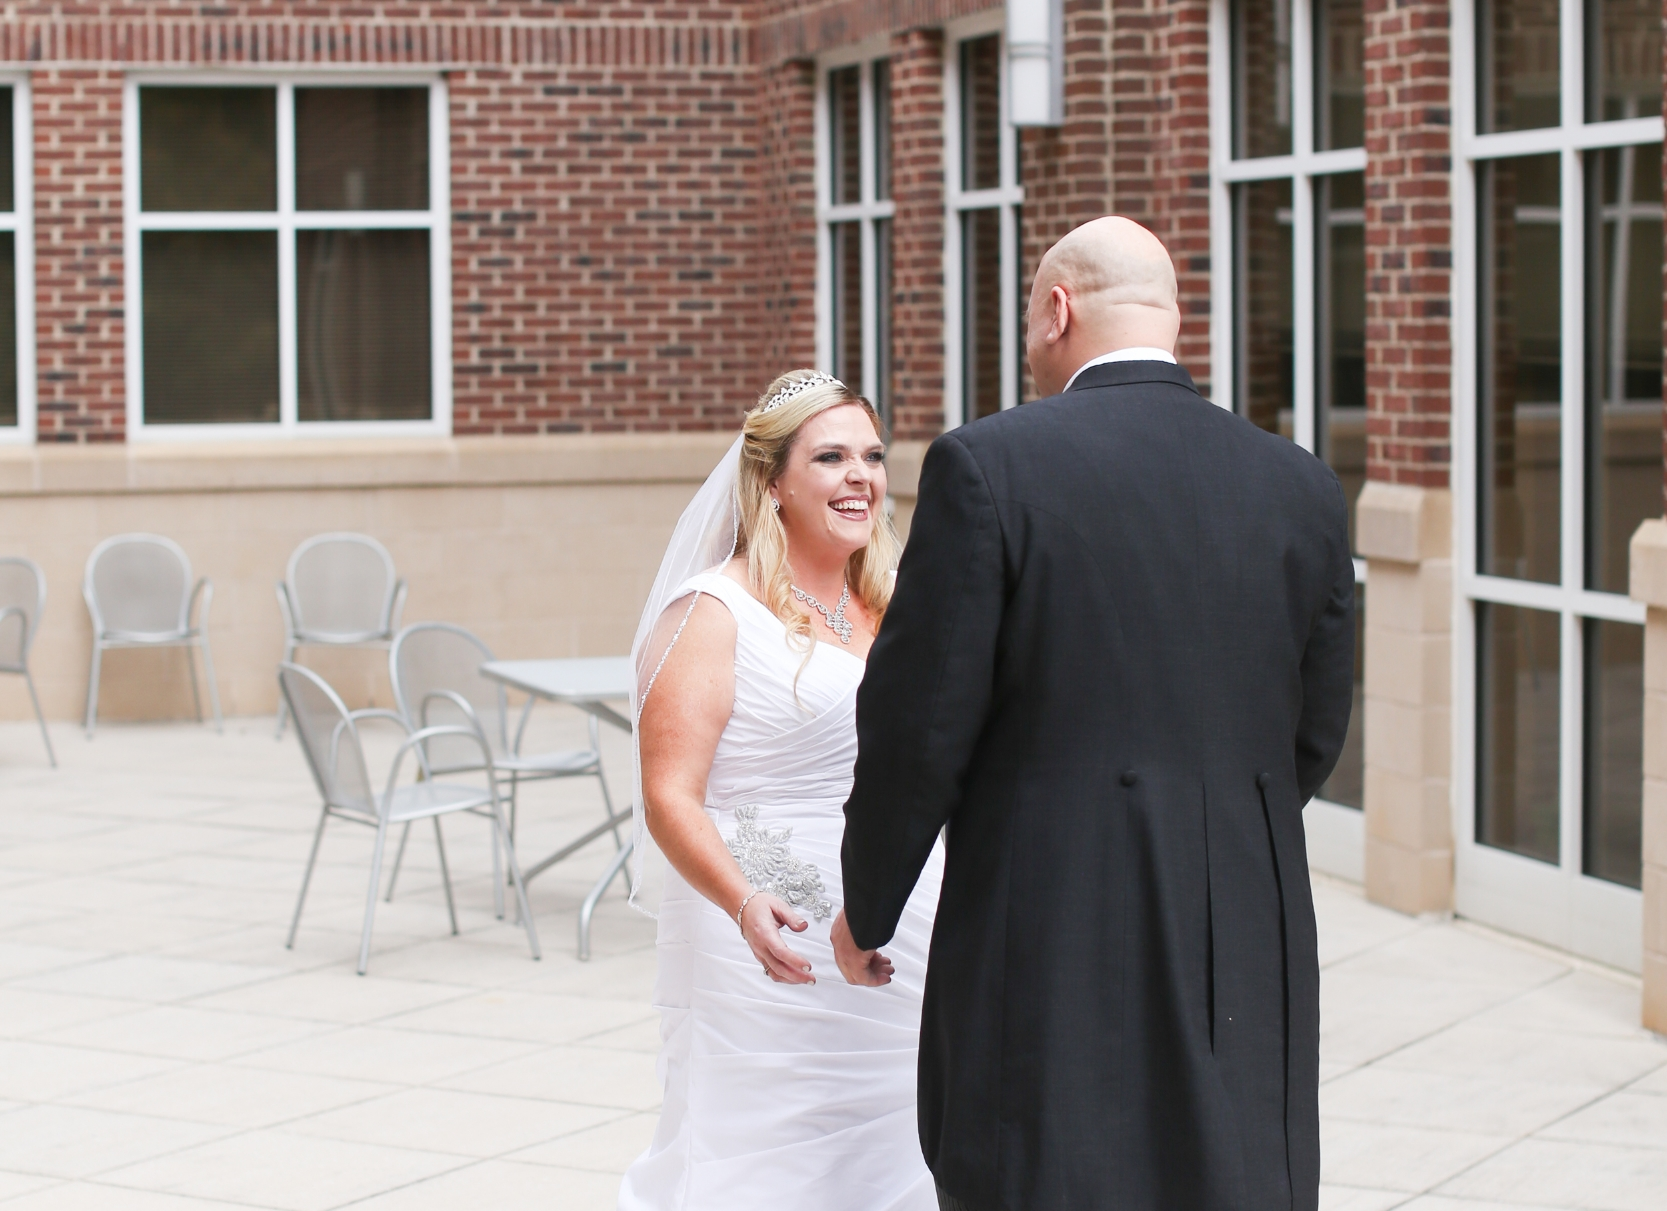 Hough_Wedding_North_Carolina_Charlotte_JonCourvillePhotography-149.jpg